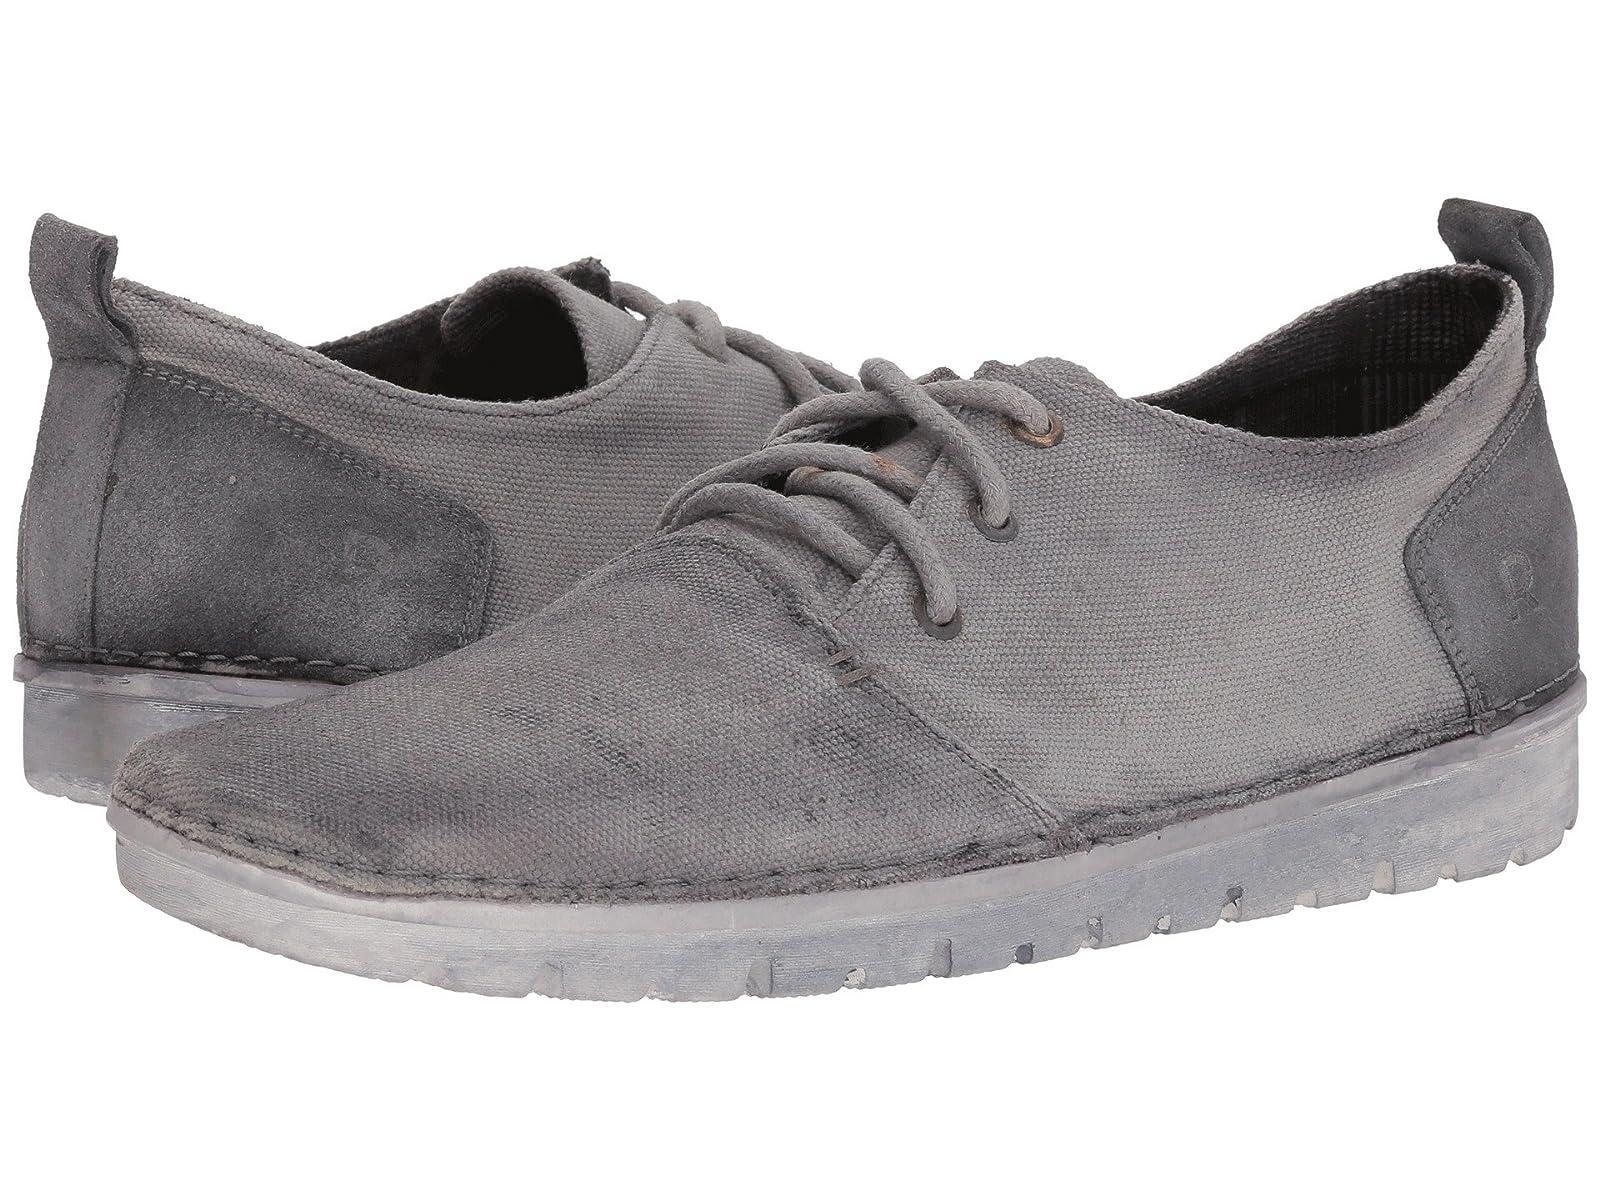 Roan Sanders Vintage by RoanAtmospheric grades have affordable shoes